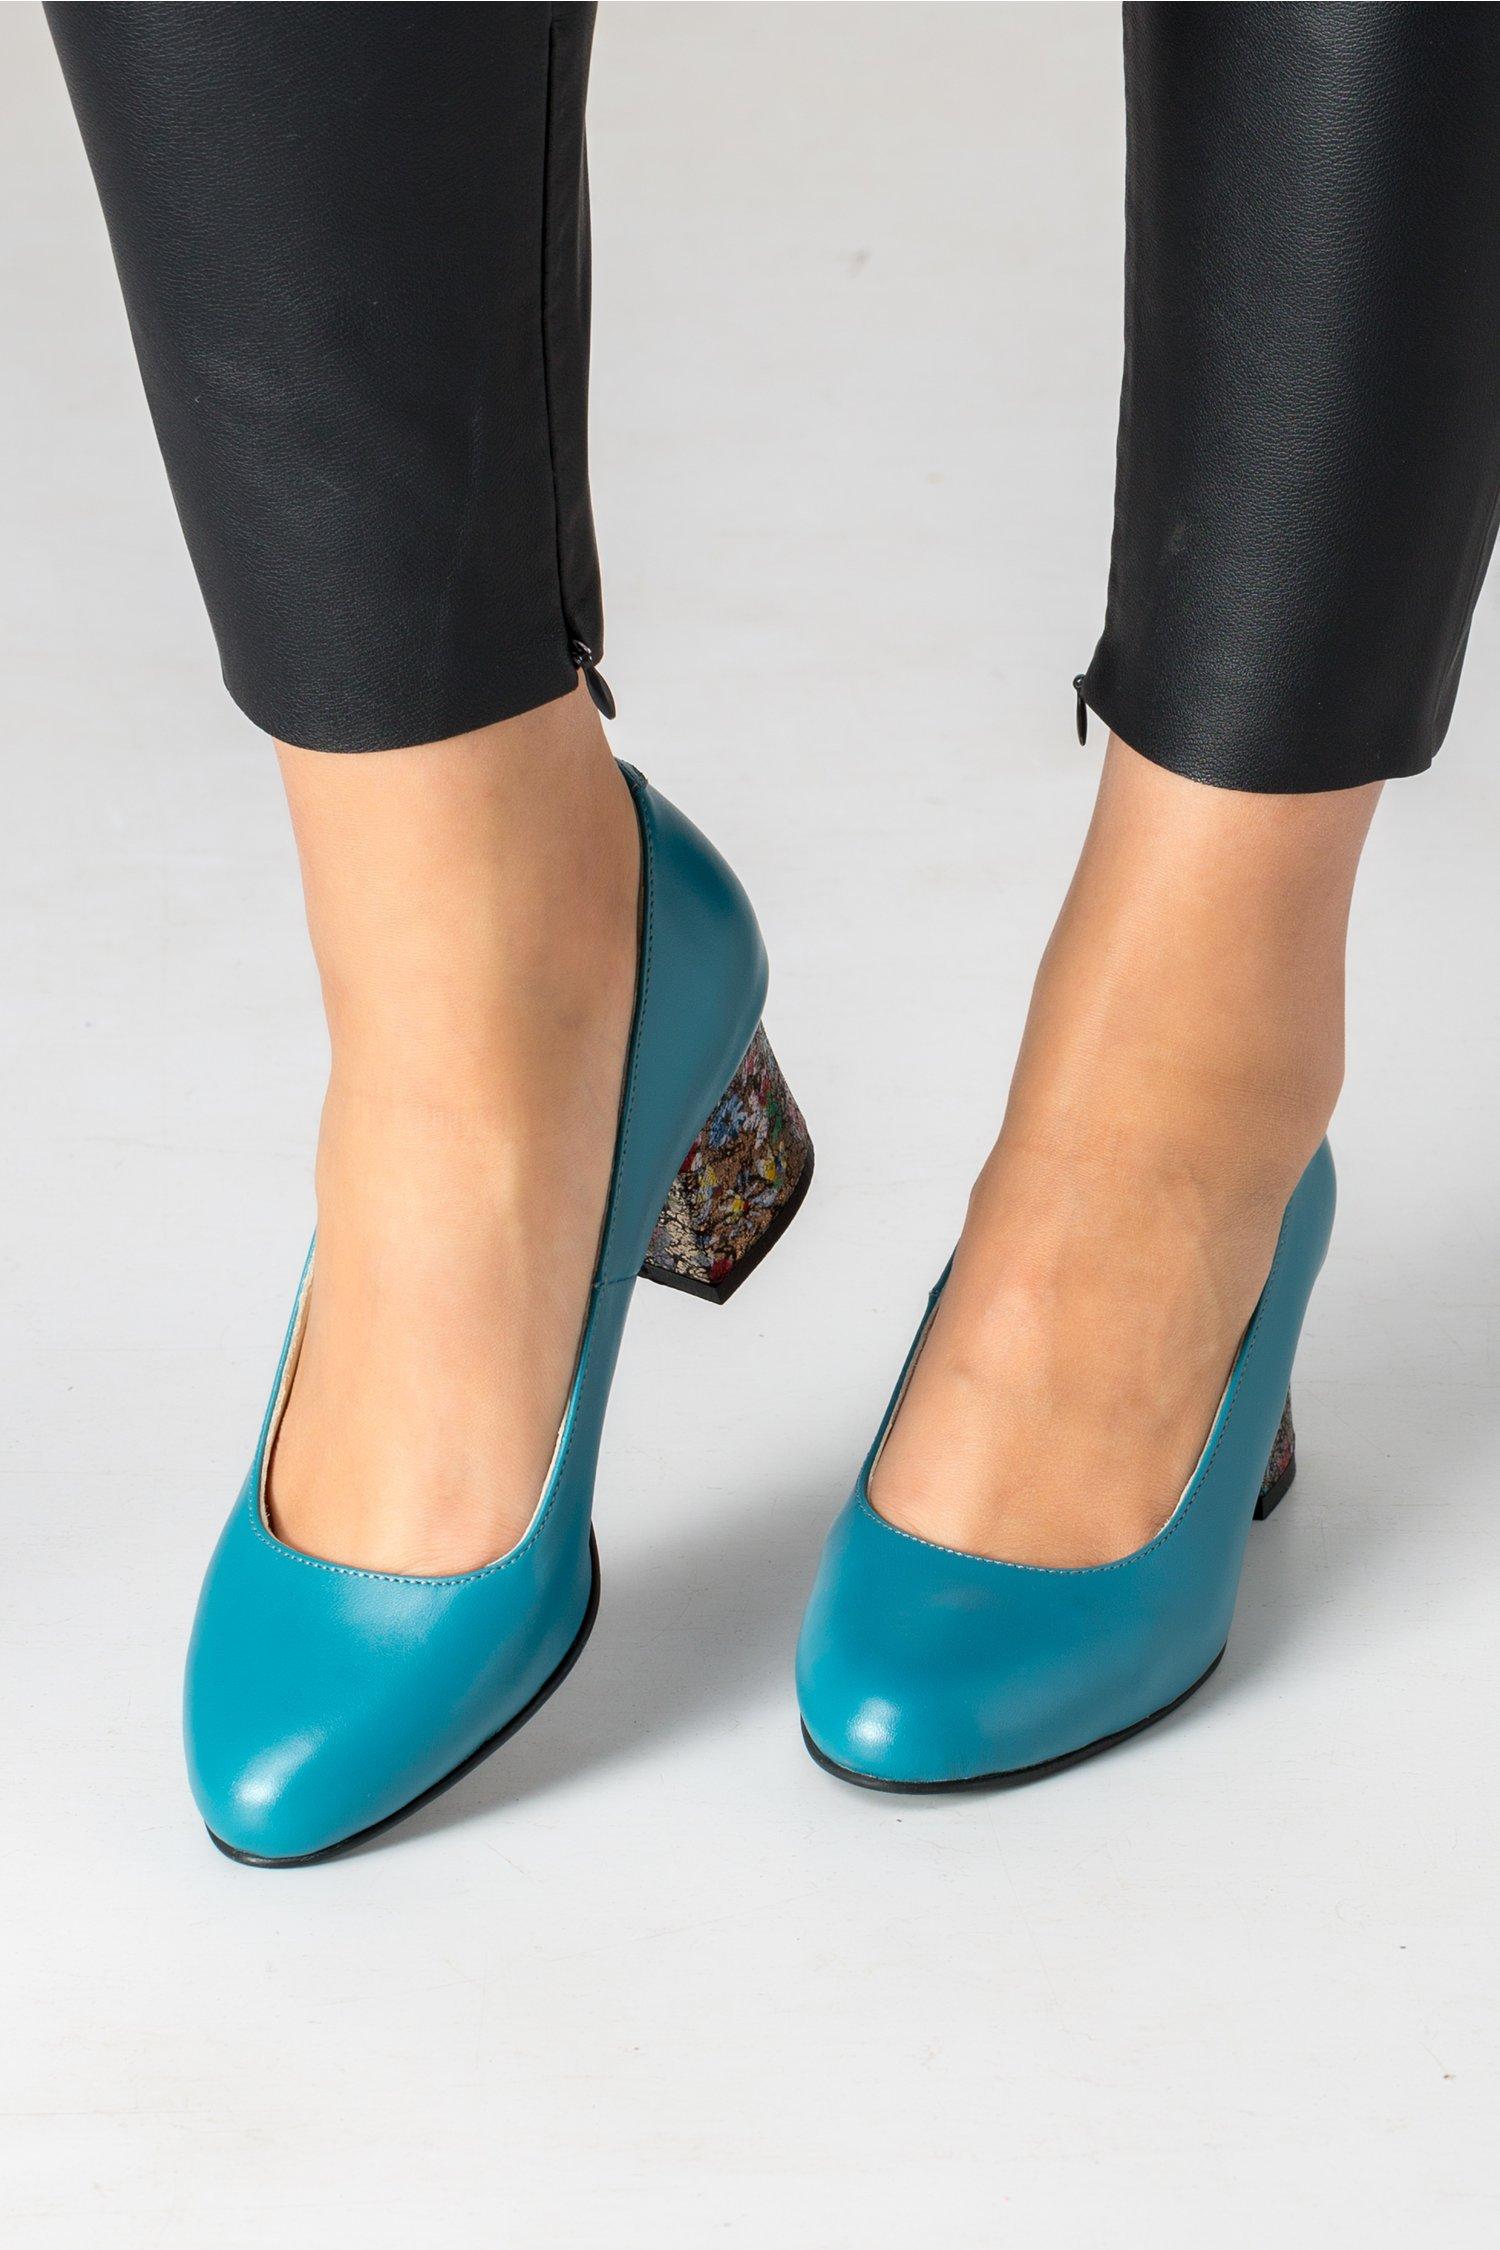 Pantofi turcoaz cu insertii aurii si flori pe toc